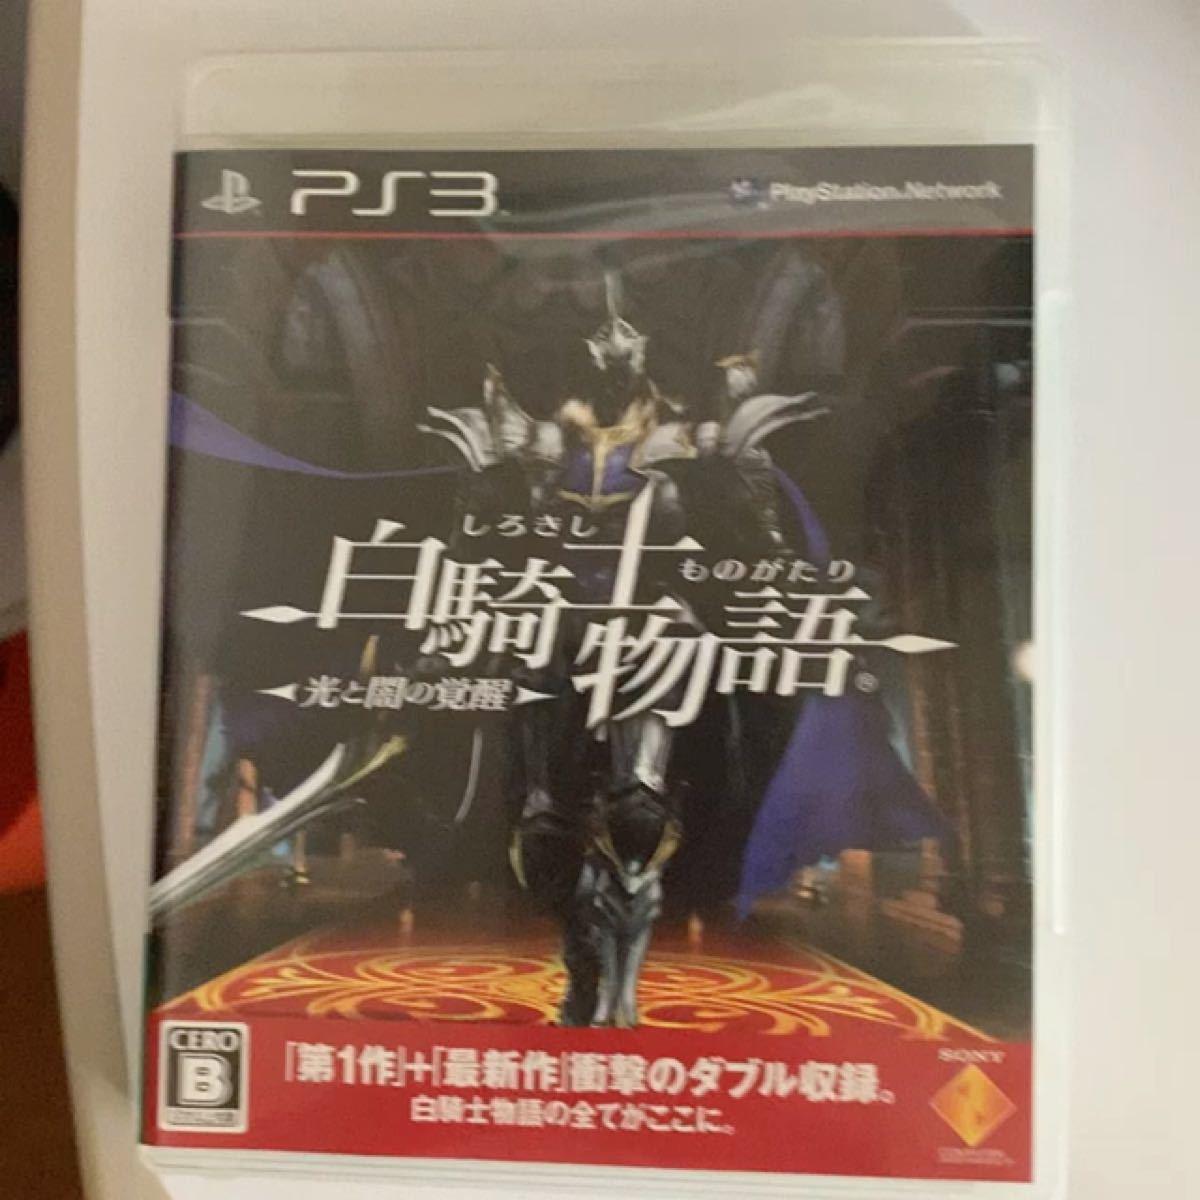 【PS3】 白騎士物語 -光と闇の覚醒- [通常版]